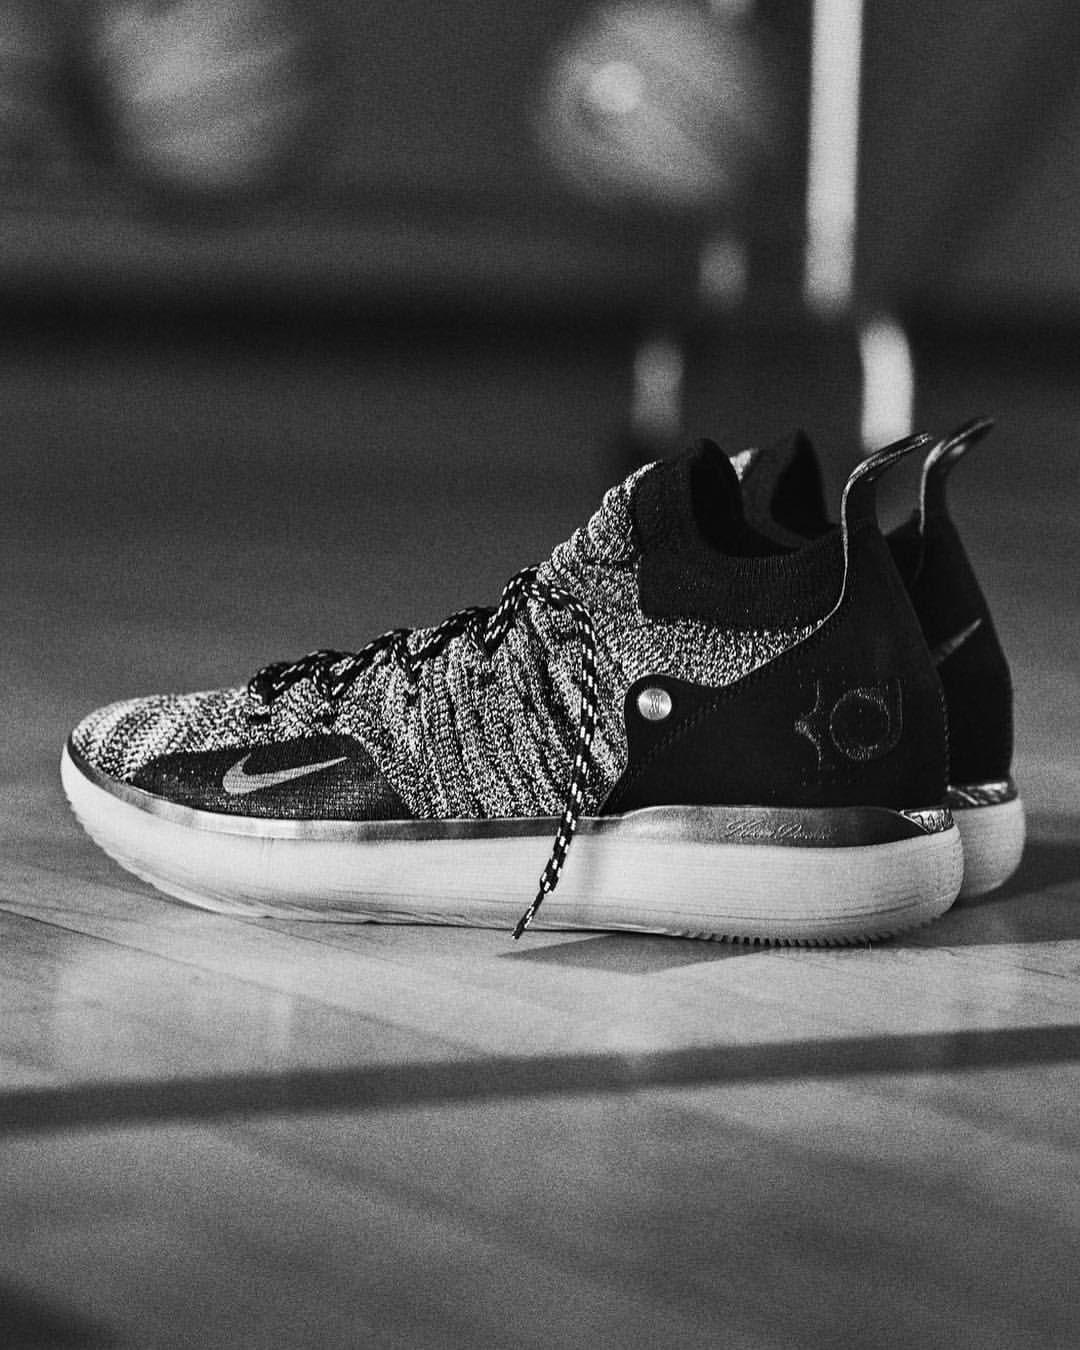 22a4f6b34bb5 Here s a first look at the Nike KD 11. Thoughts